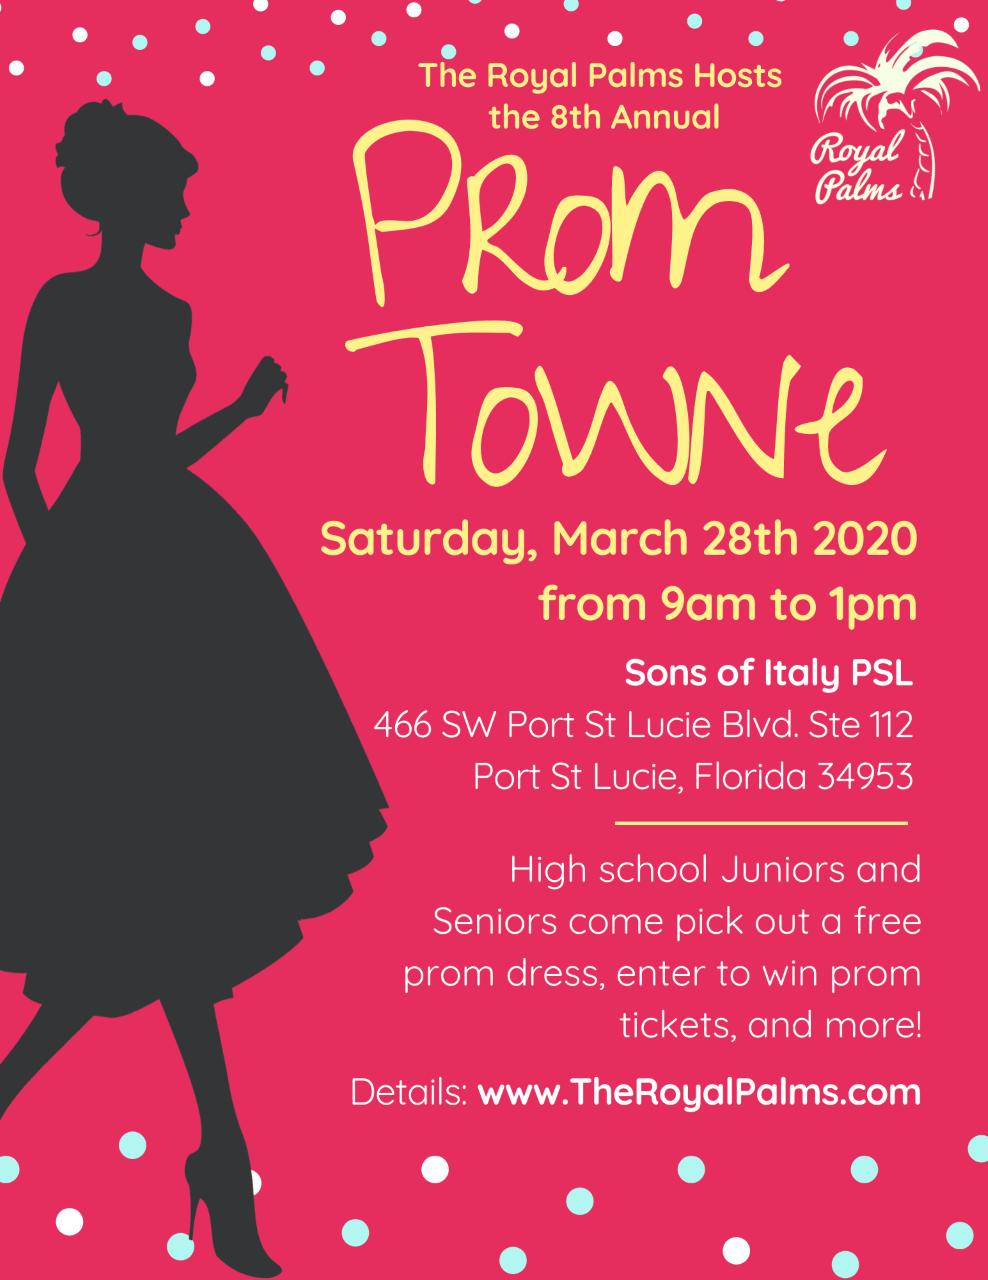 Royal Palms Prom Towne